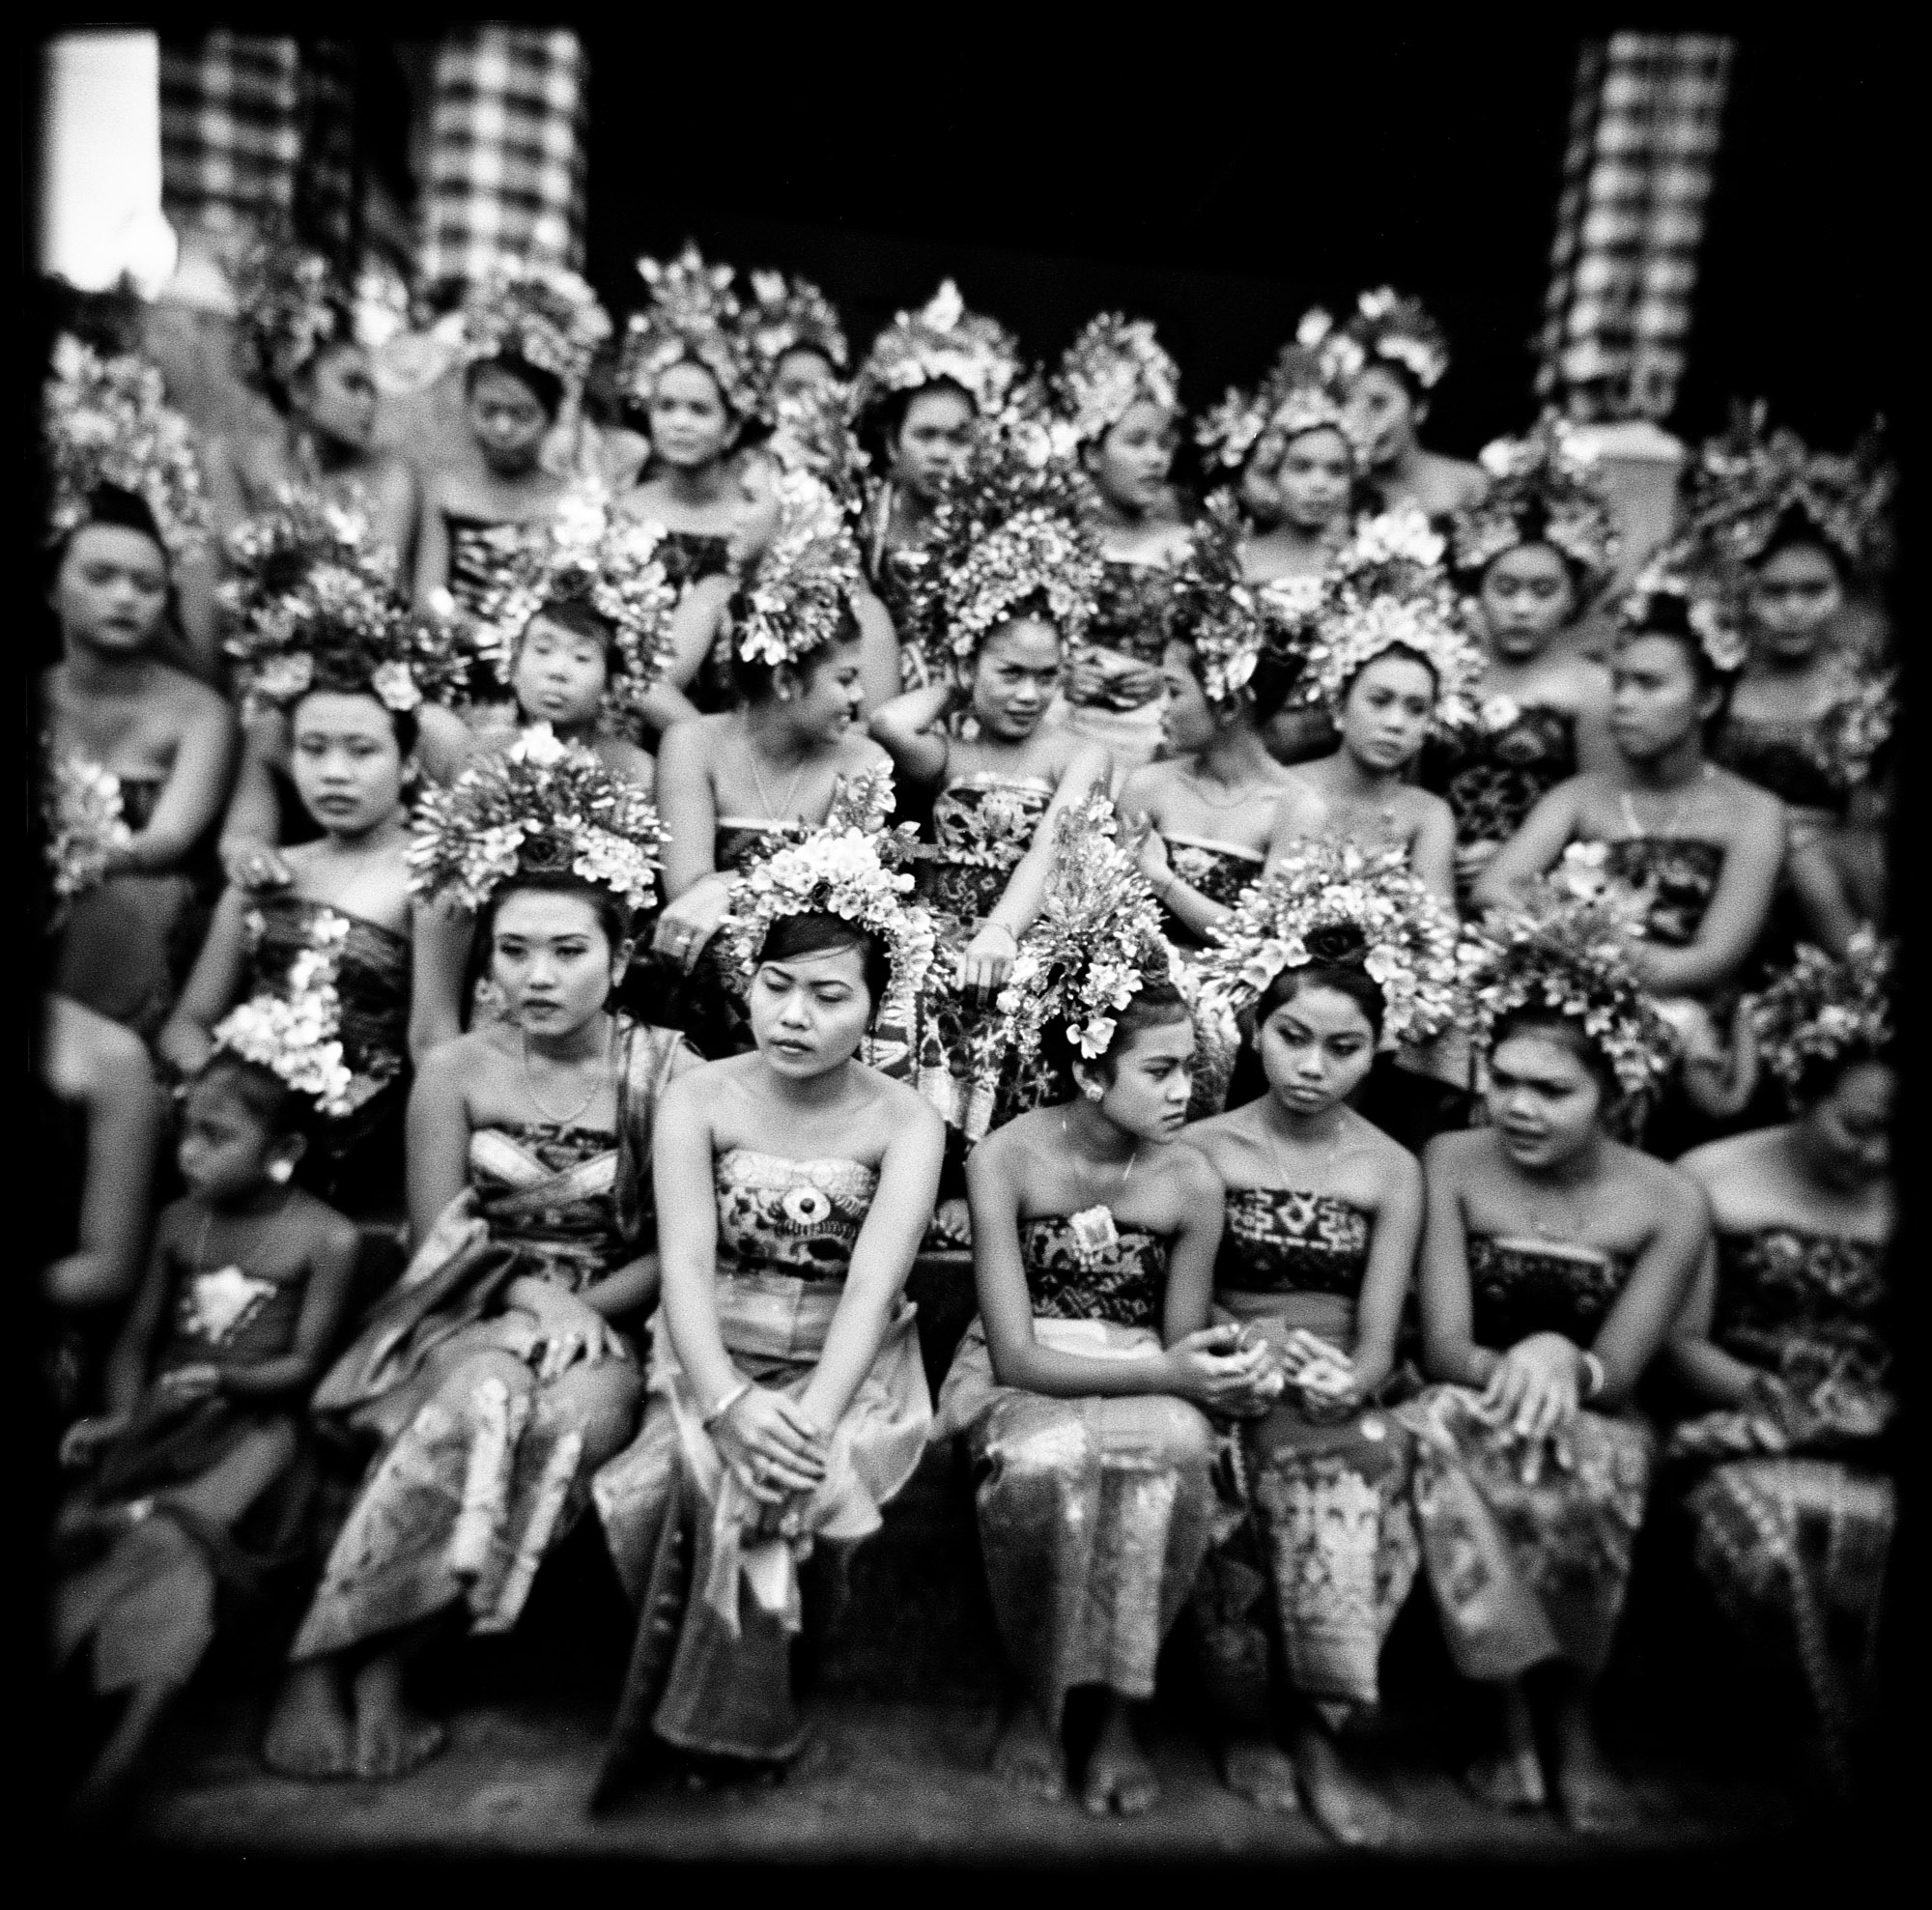 WebSP_methapisic spirituality_AgungParameswara_020.JPG